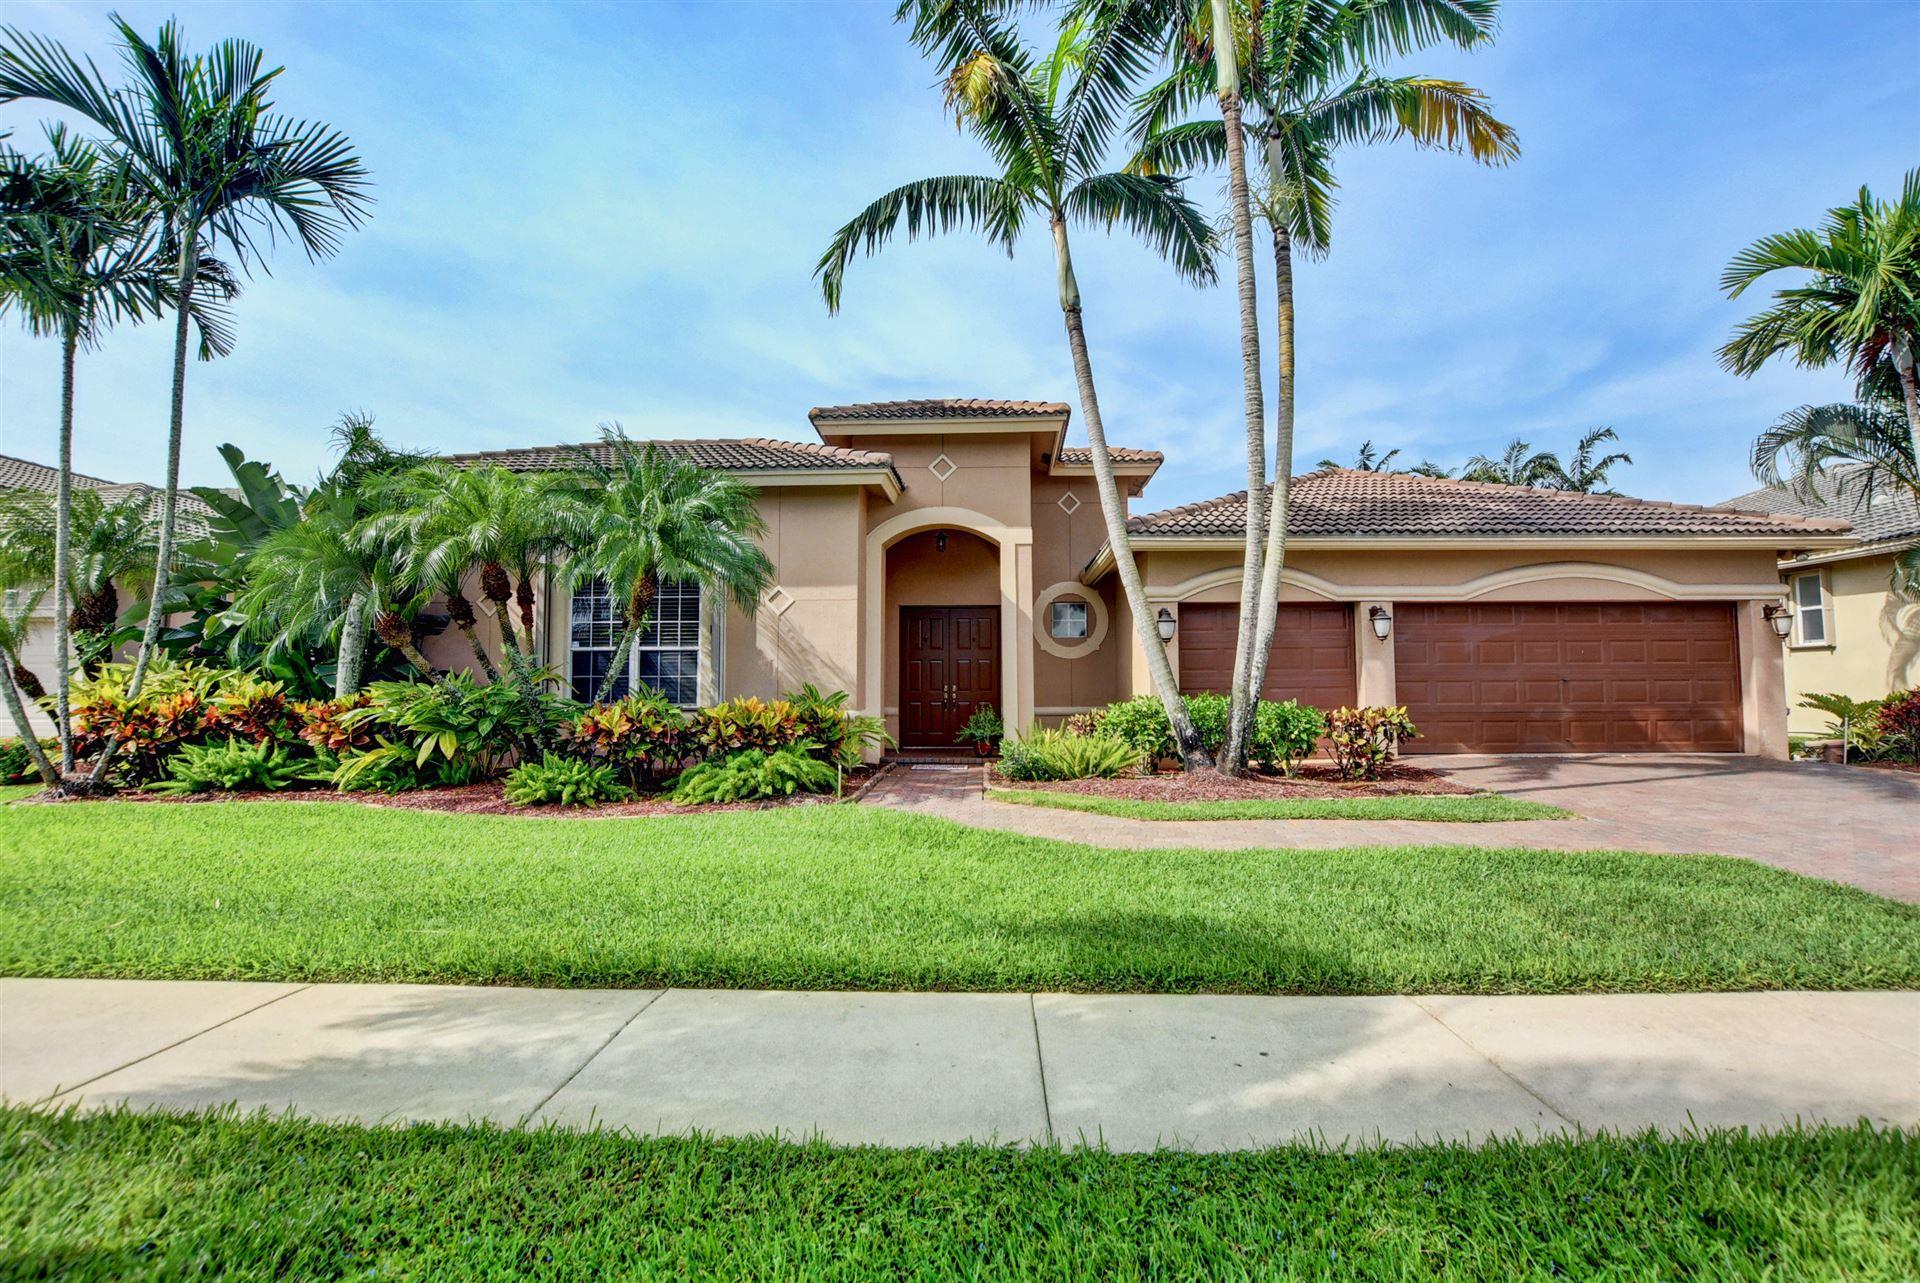 1803 Waldorf Dr Drive, Royal Palm Beach, FL 33411 - #: RX-10626550